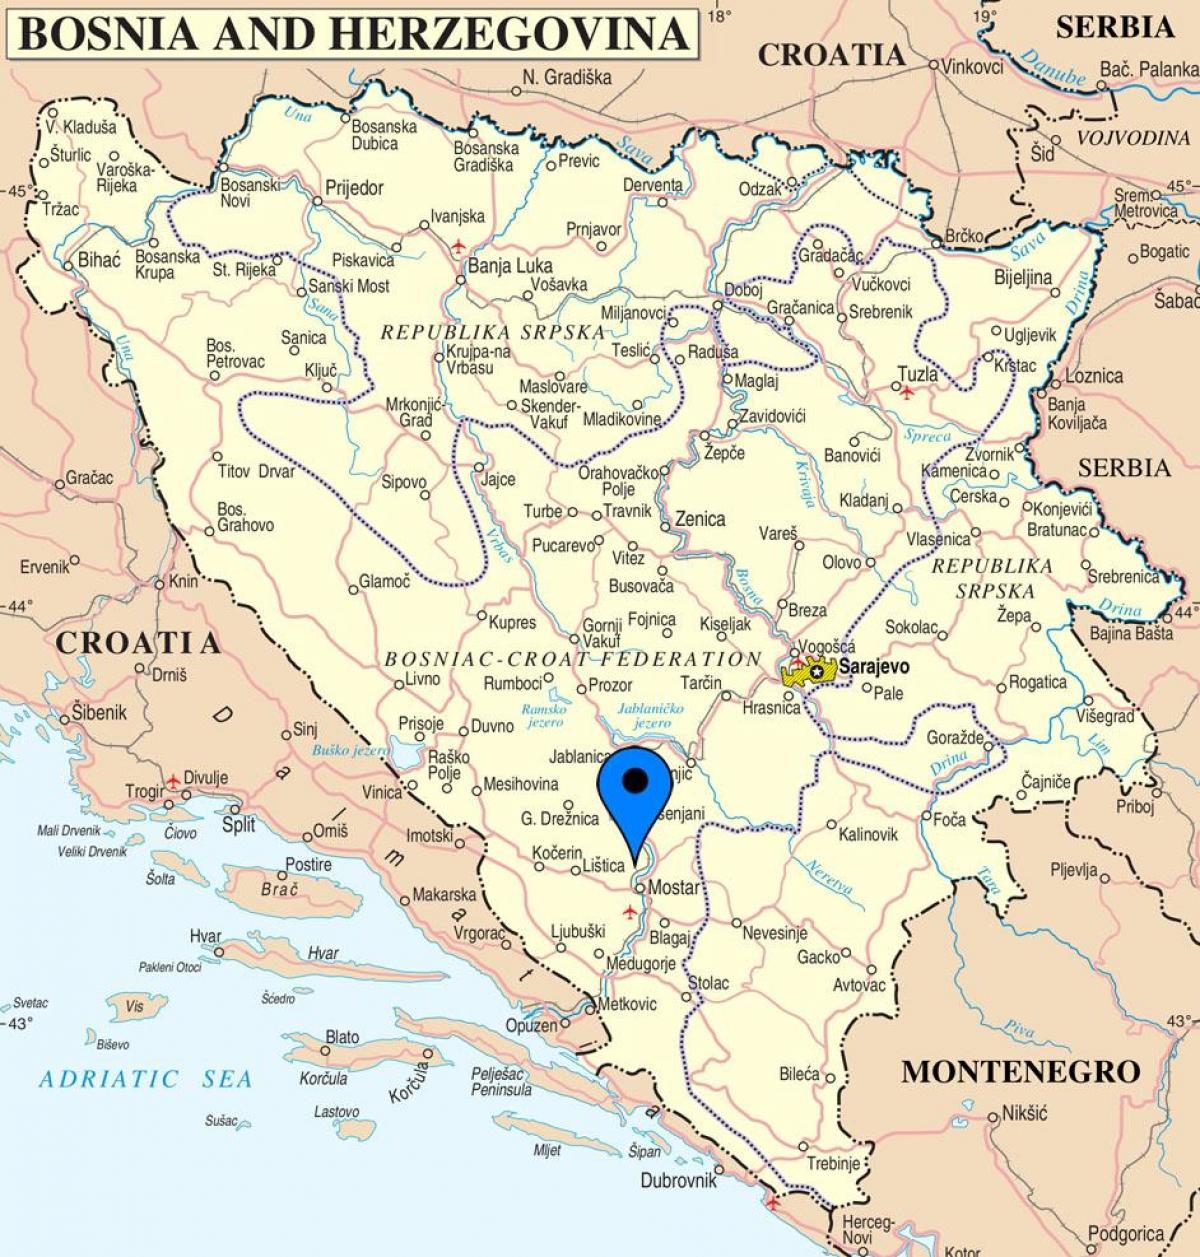 Mostar Bosnien Map Karte Von Mostar Bosnien Herzegowina Europa